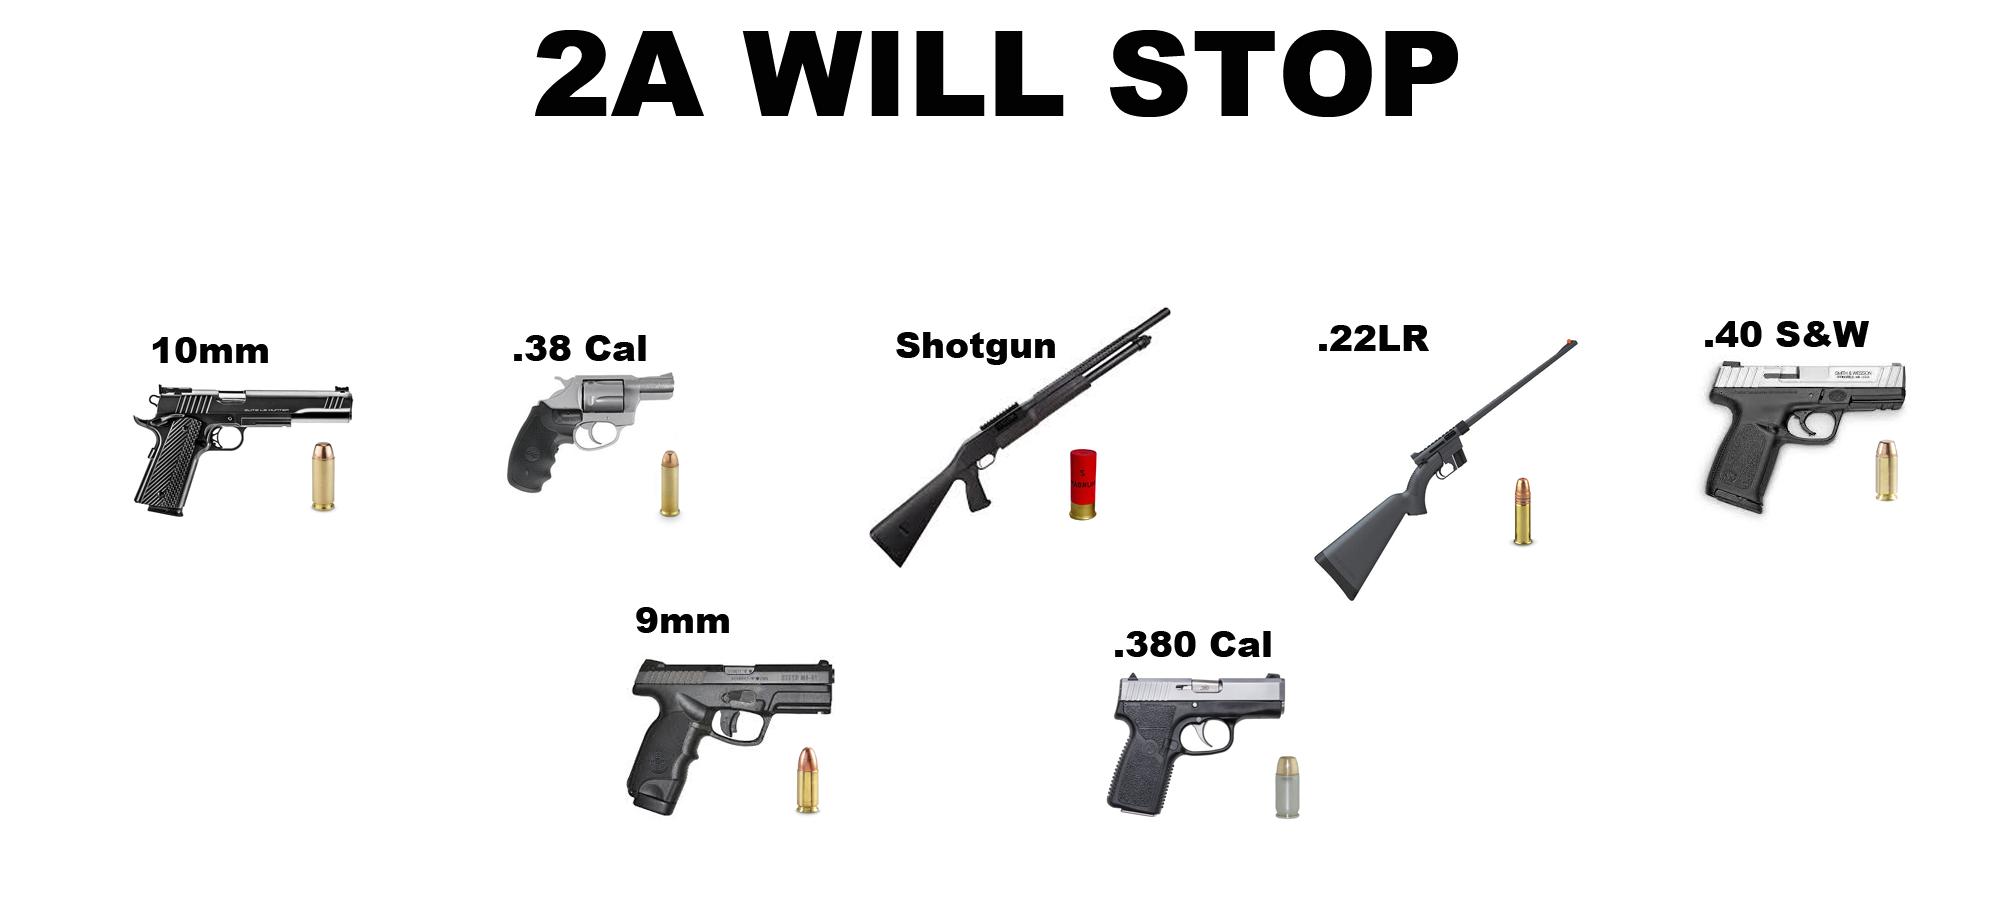 2A plates capability